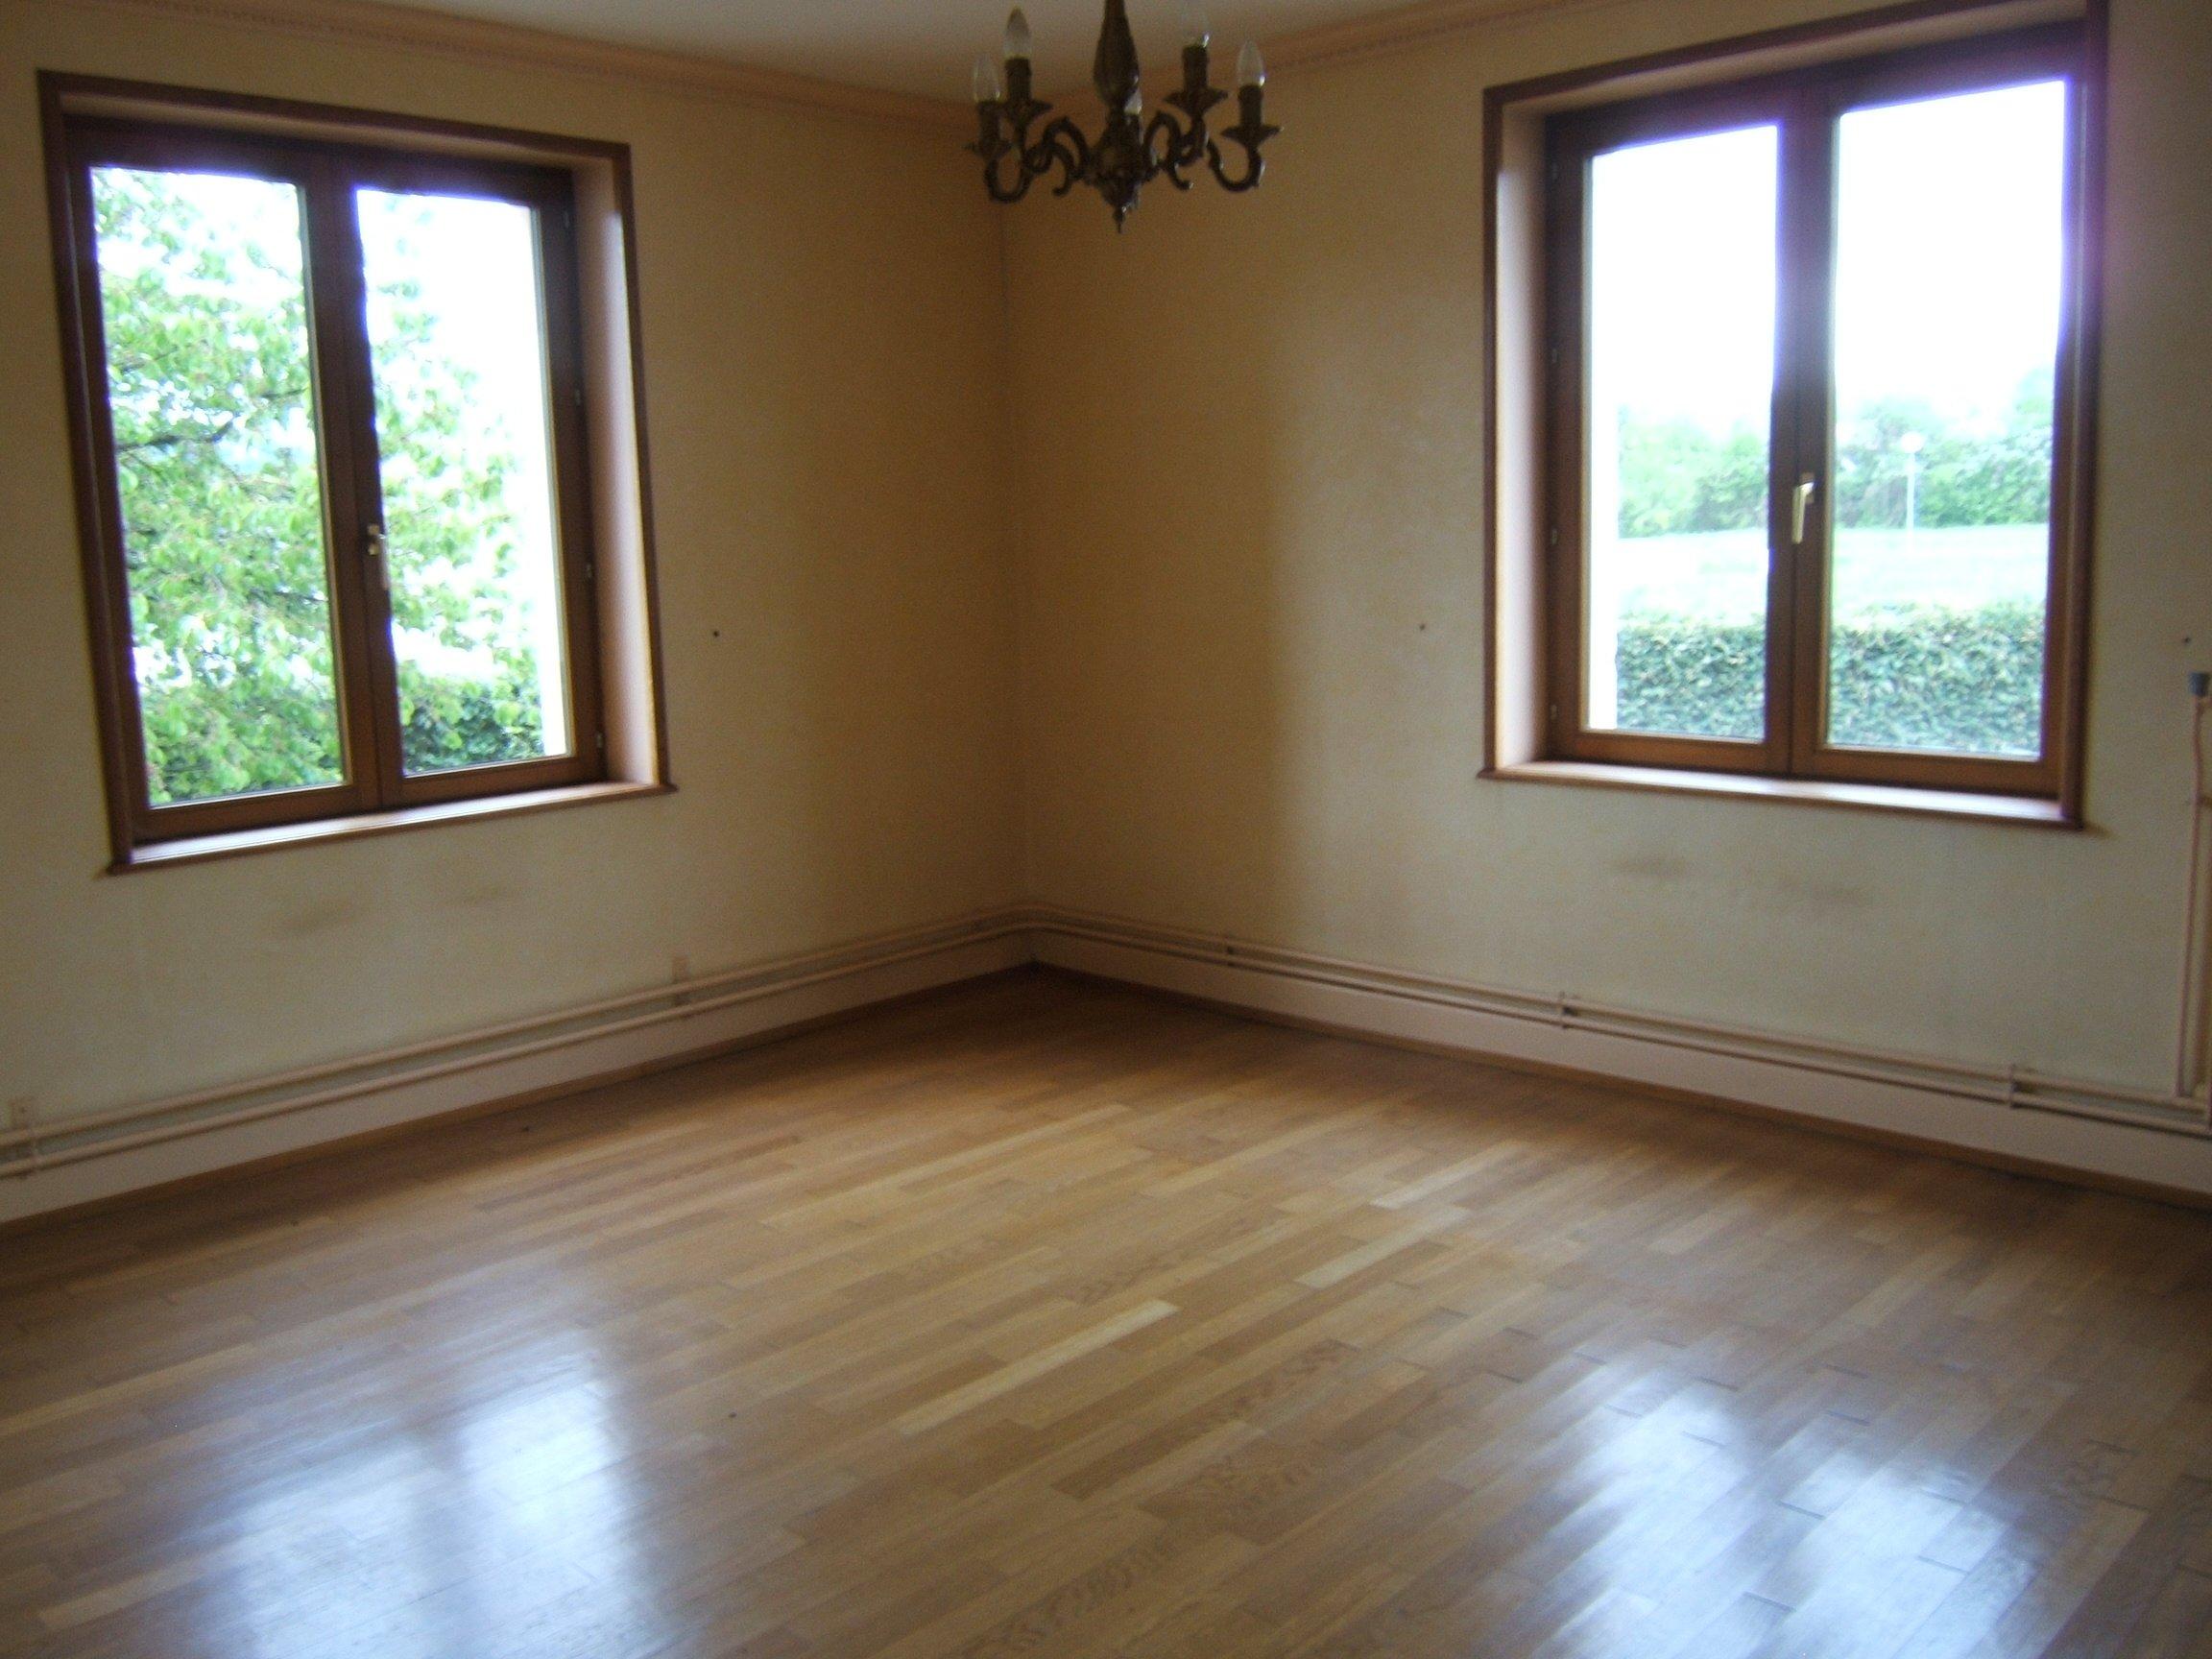 constructeur v randa belgique. Black Bedroom Furniture Sets. Home Design Ideas